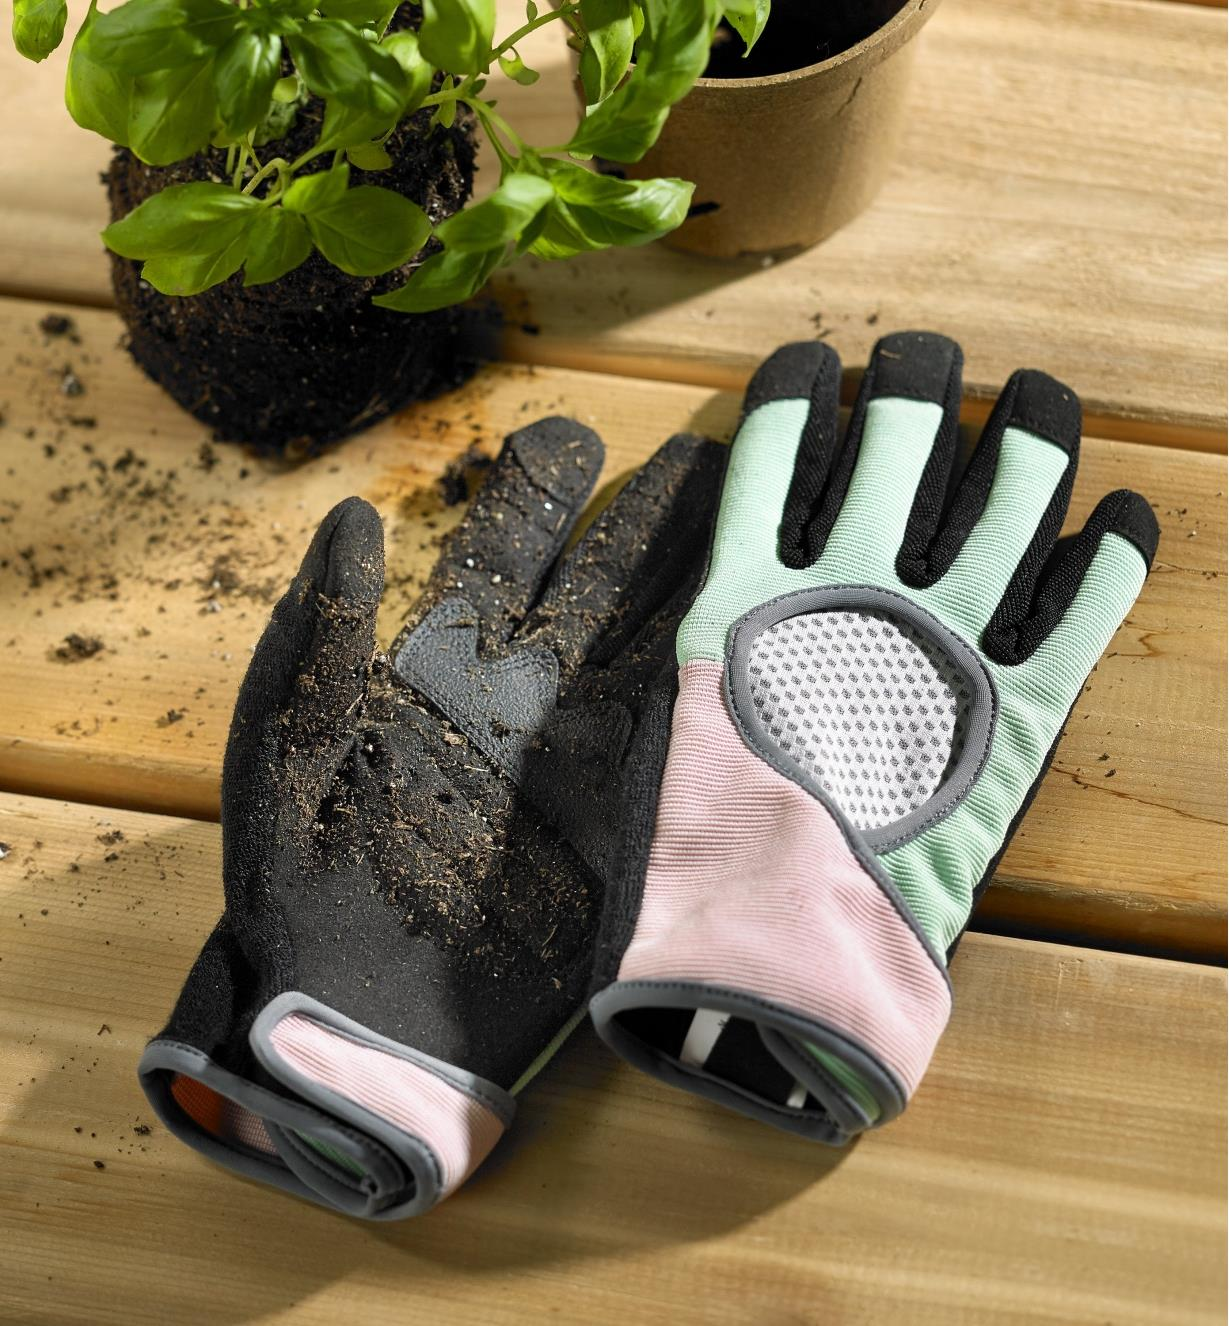 Women's garden gloves encrusted with soil